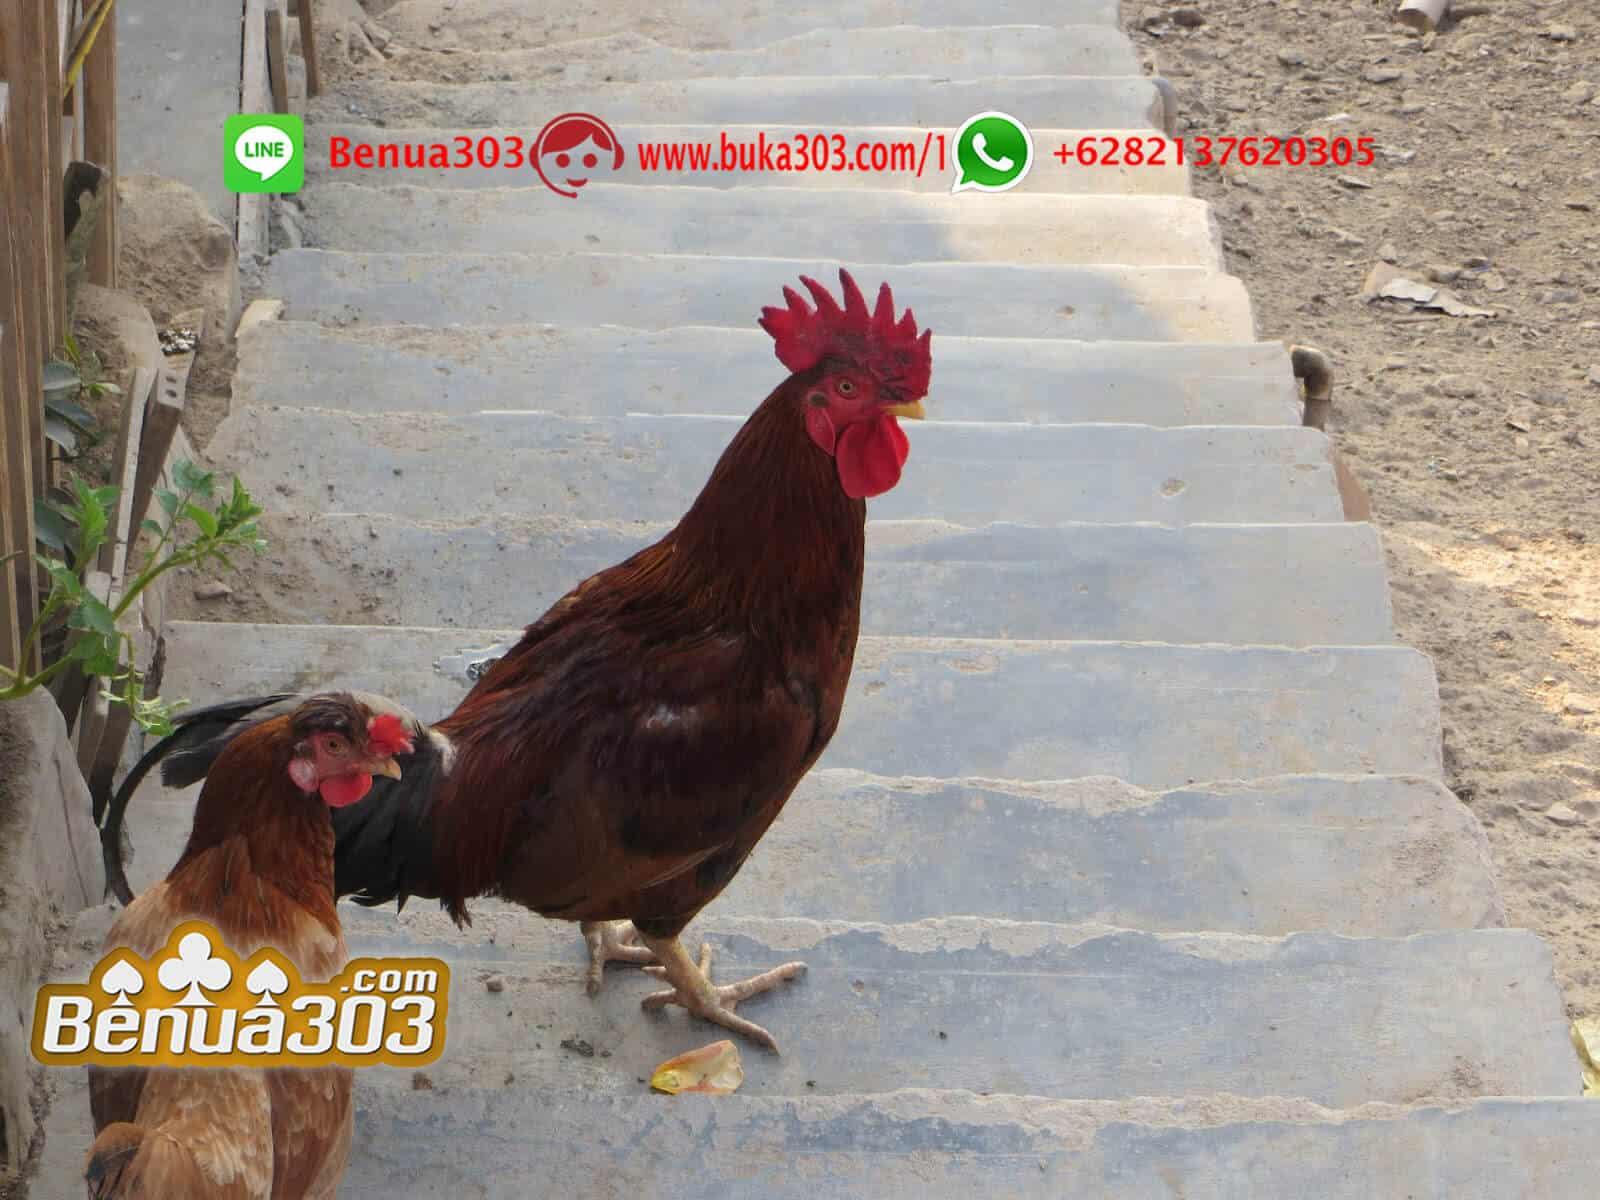 Cara Menang Judi Sabung Ayam S128 Online